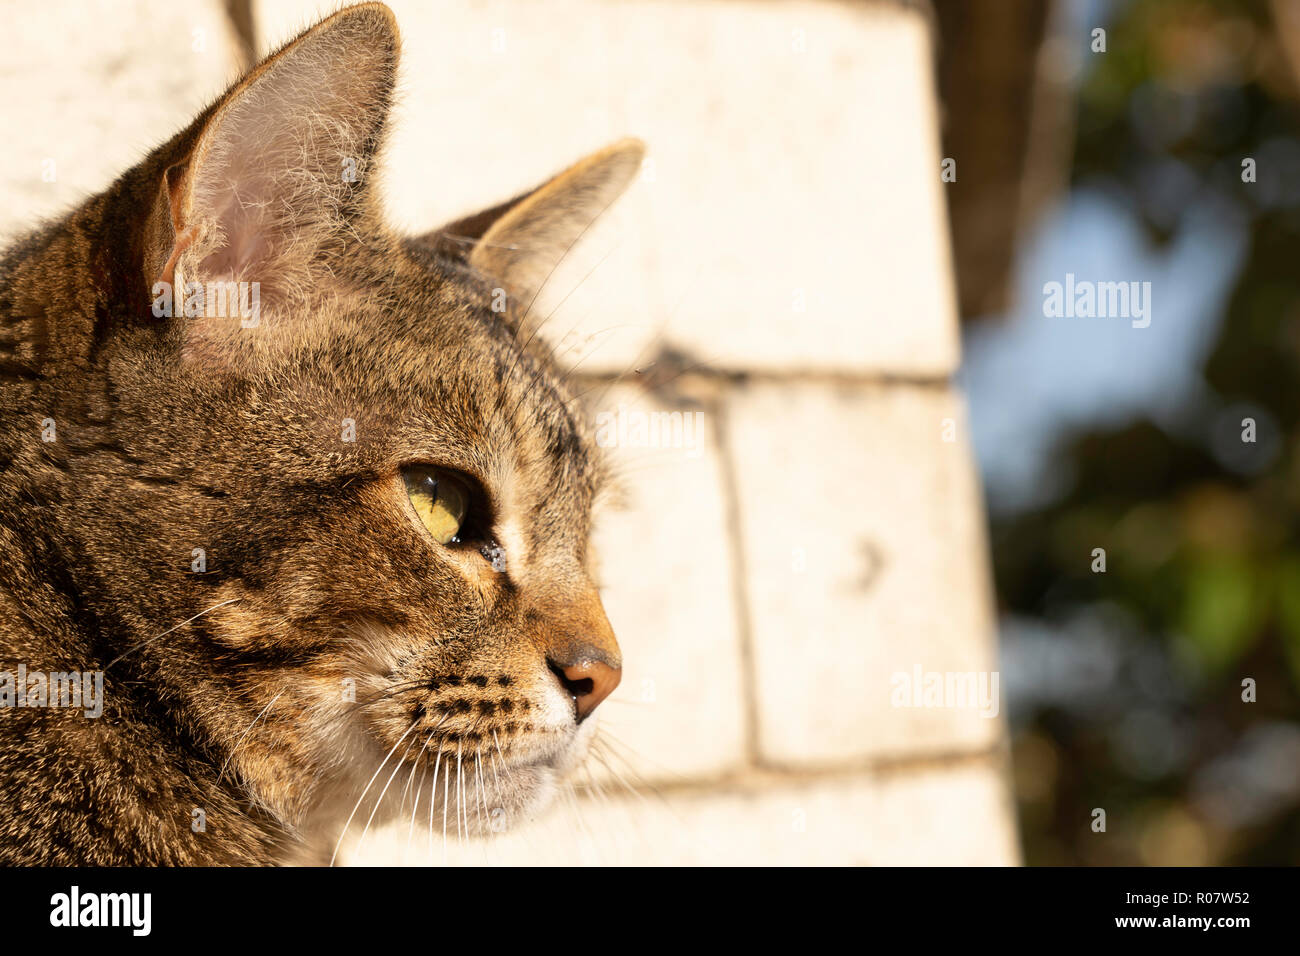 Tabby Cat outdoor portrait. - Stock Image